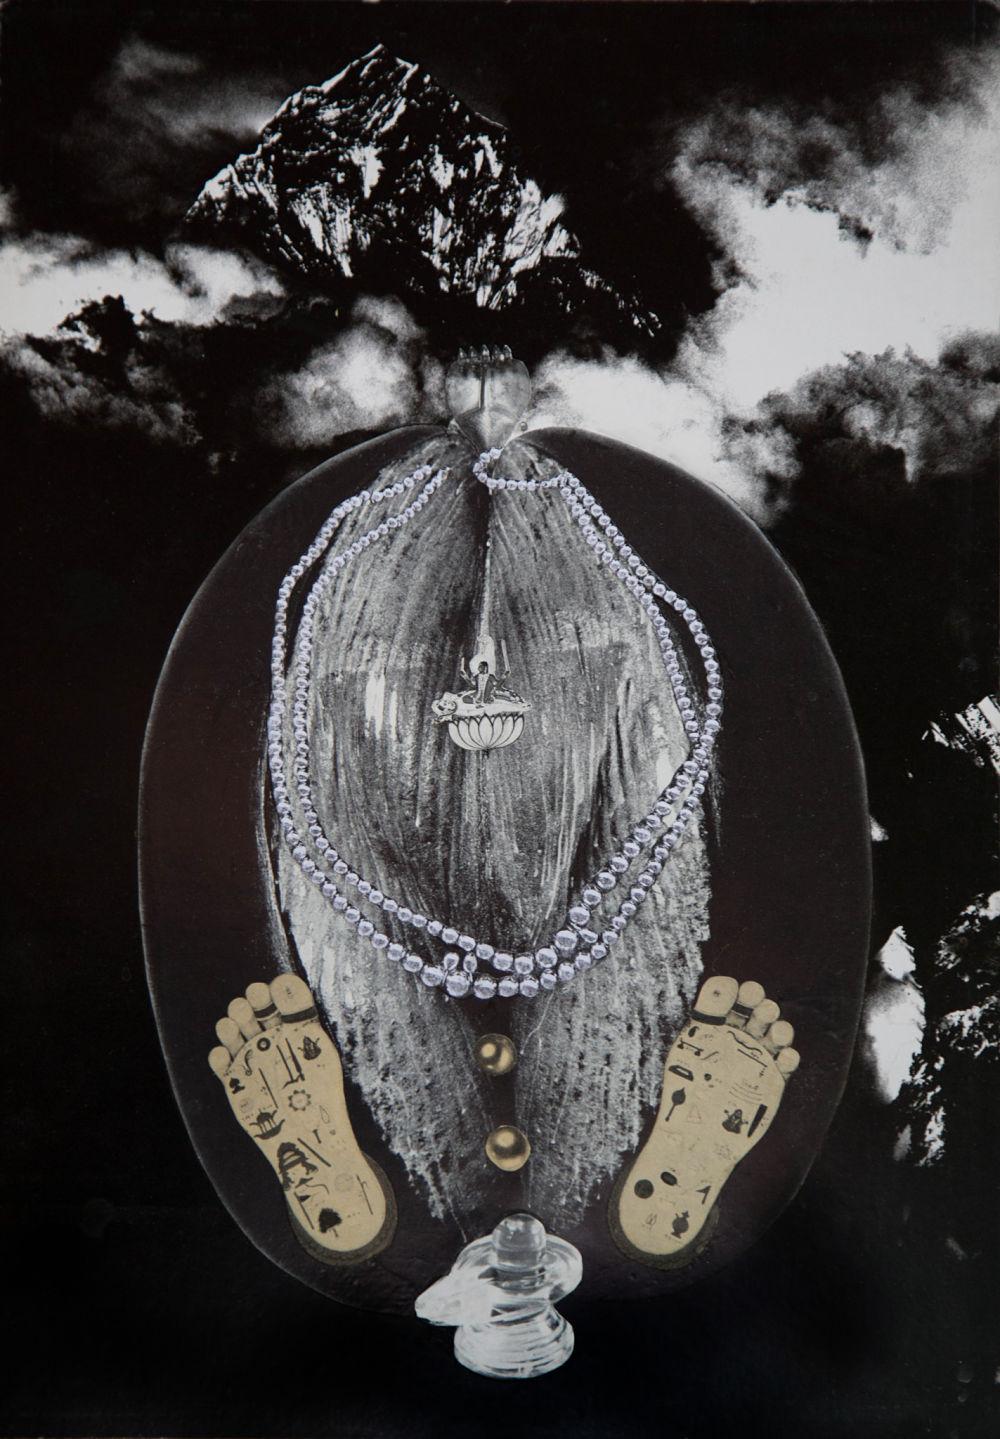 Penny SLINGER, Coco de Mer, 1976. Photo collage on board 41.9 x 29.5 cm. Copyright the Artist; Courtesy Richard Saltoun Gallery